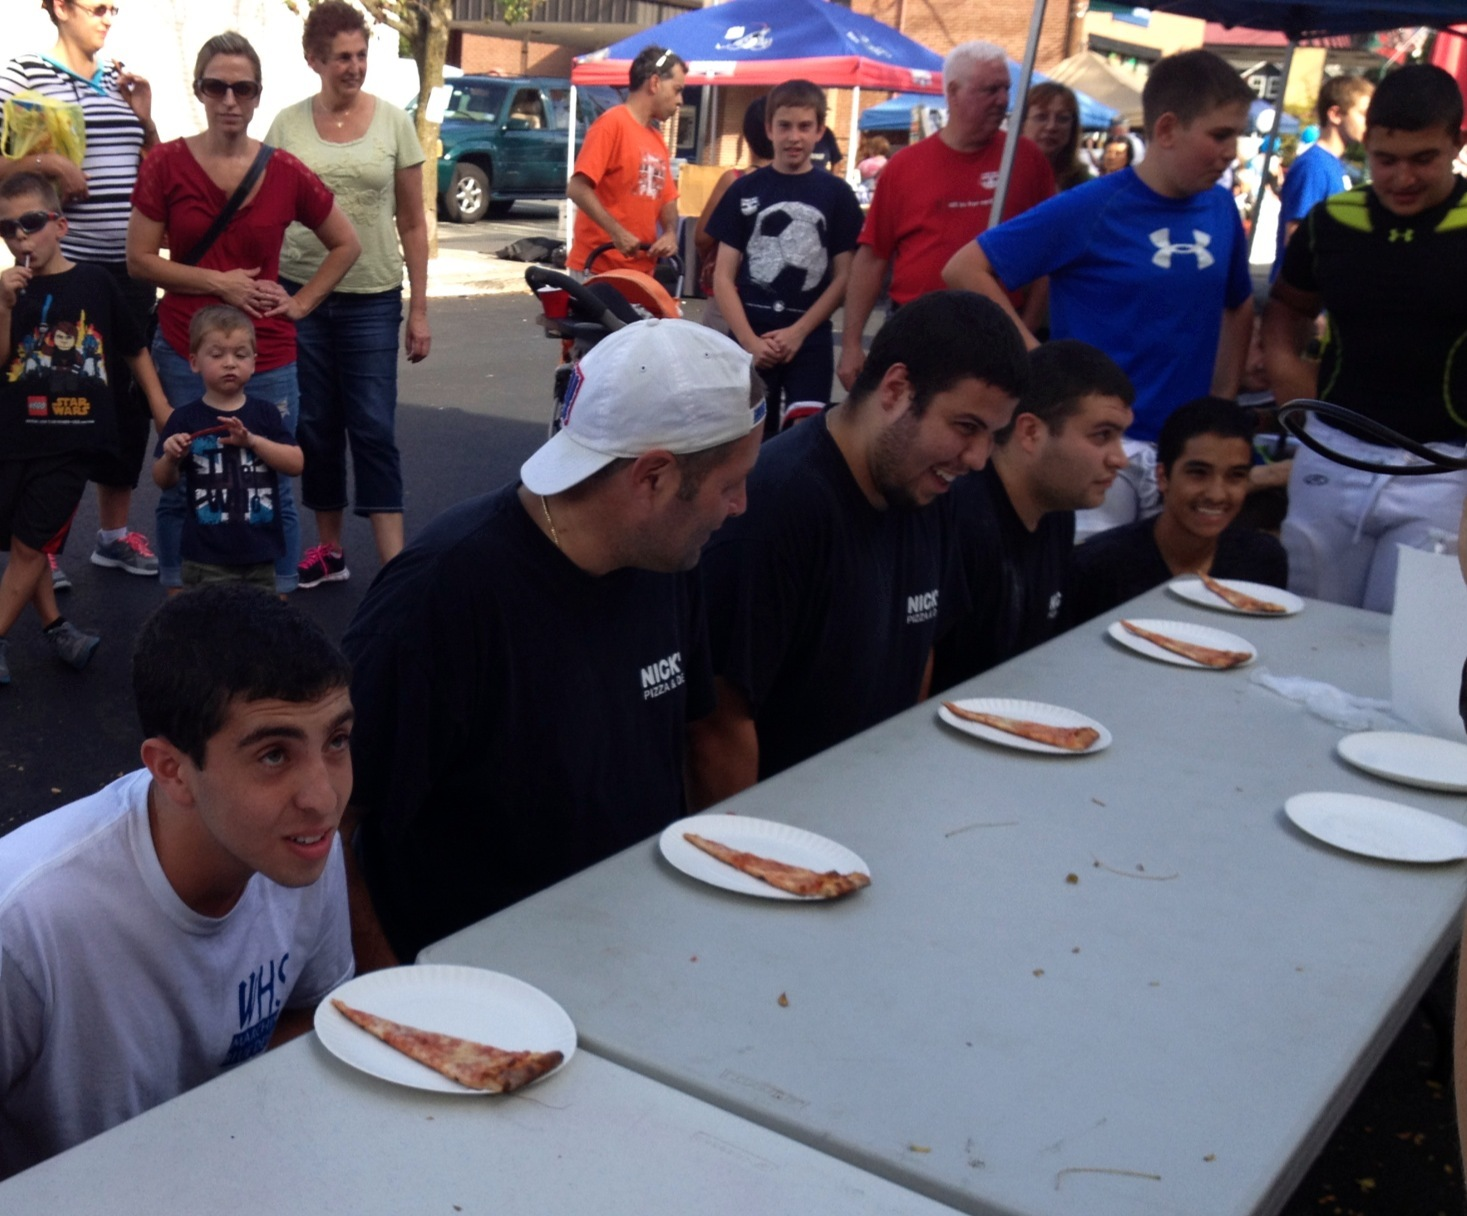 bc73844cbd0e43a1b371_Pizza_Eating_contest.jpg